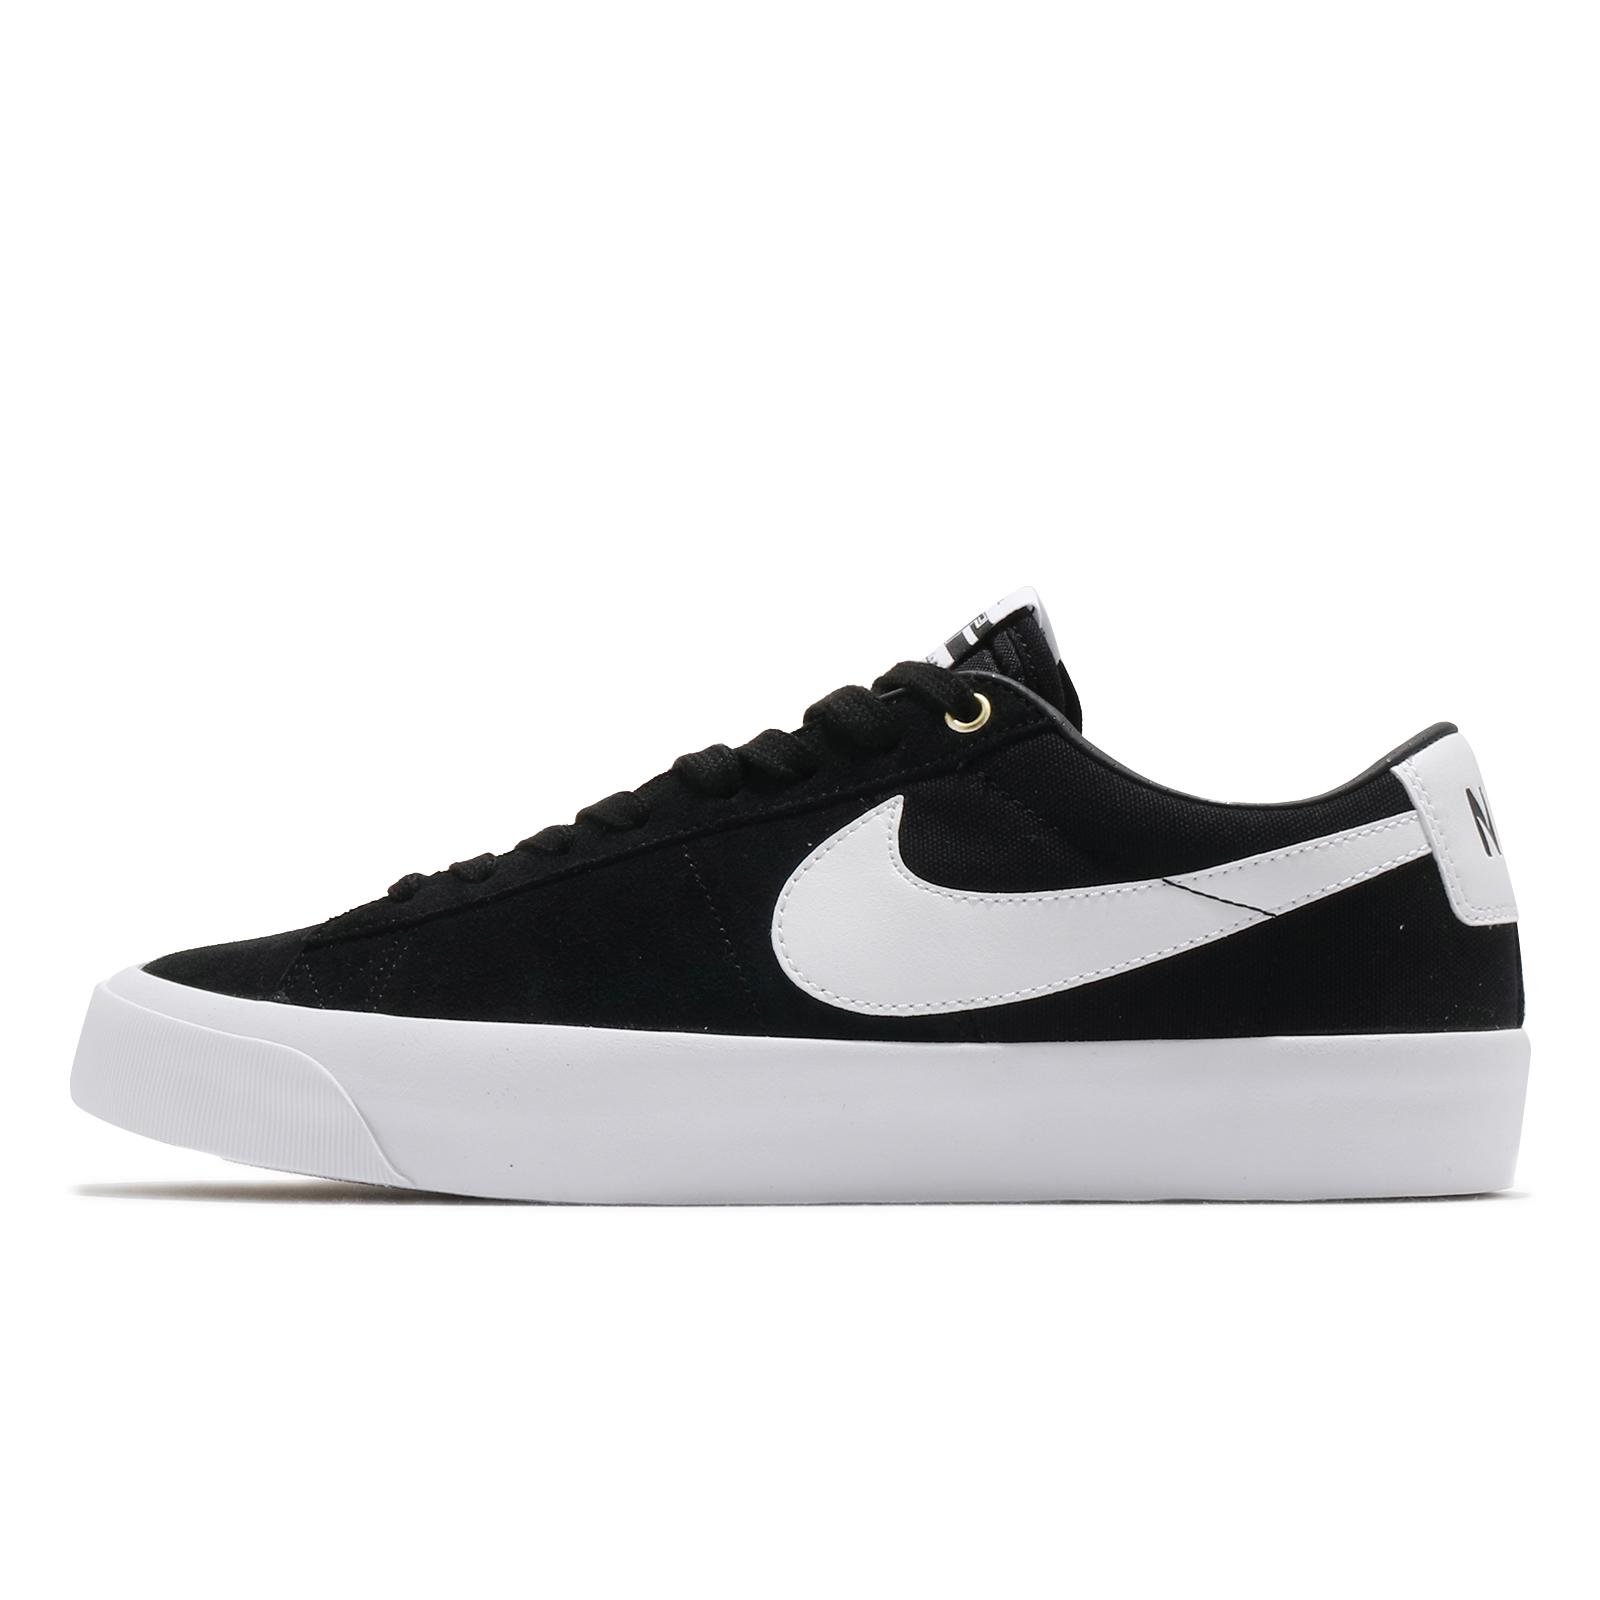 Nike 滑板鞋 SB Zoom Blazer Low Pro GT 黑 白 男鞋 休閒鞋 ACS DC7695-002